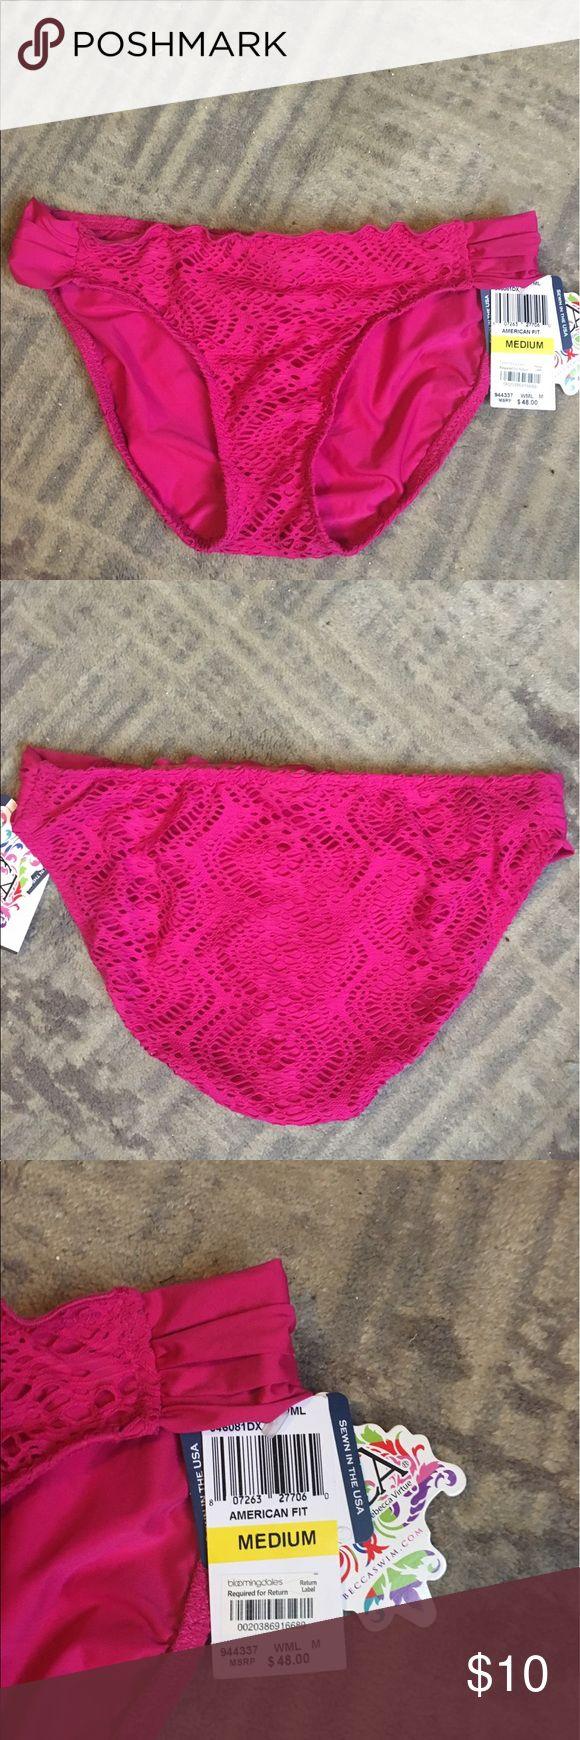 Becca hot pink bikini bottom Got pink full coverage crochet bikini bottom. New with tags. BECCA Swim Bikinis